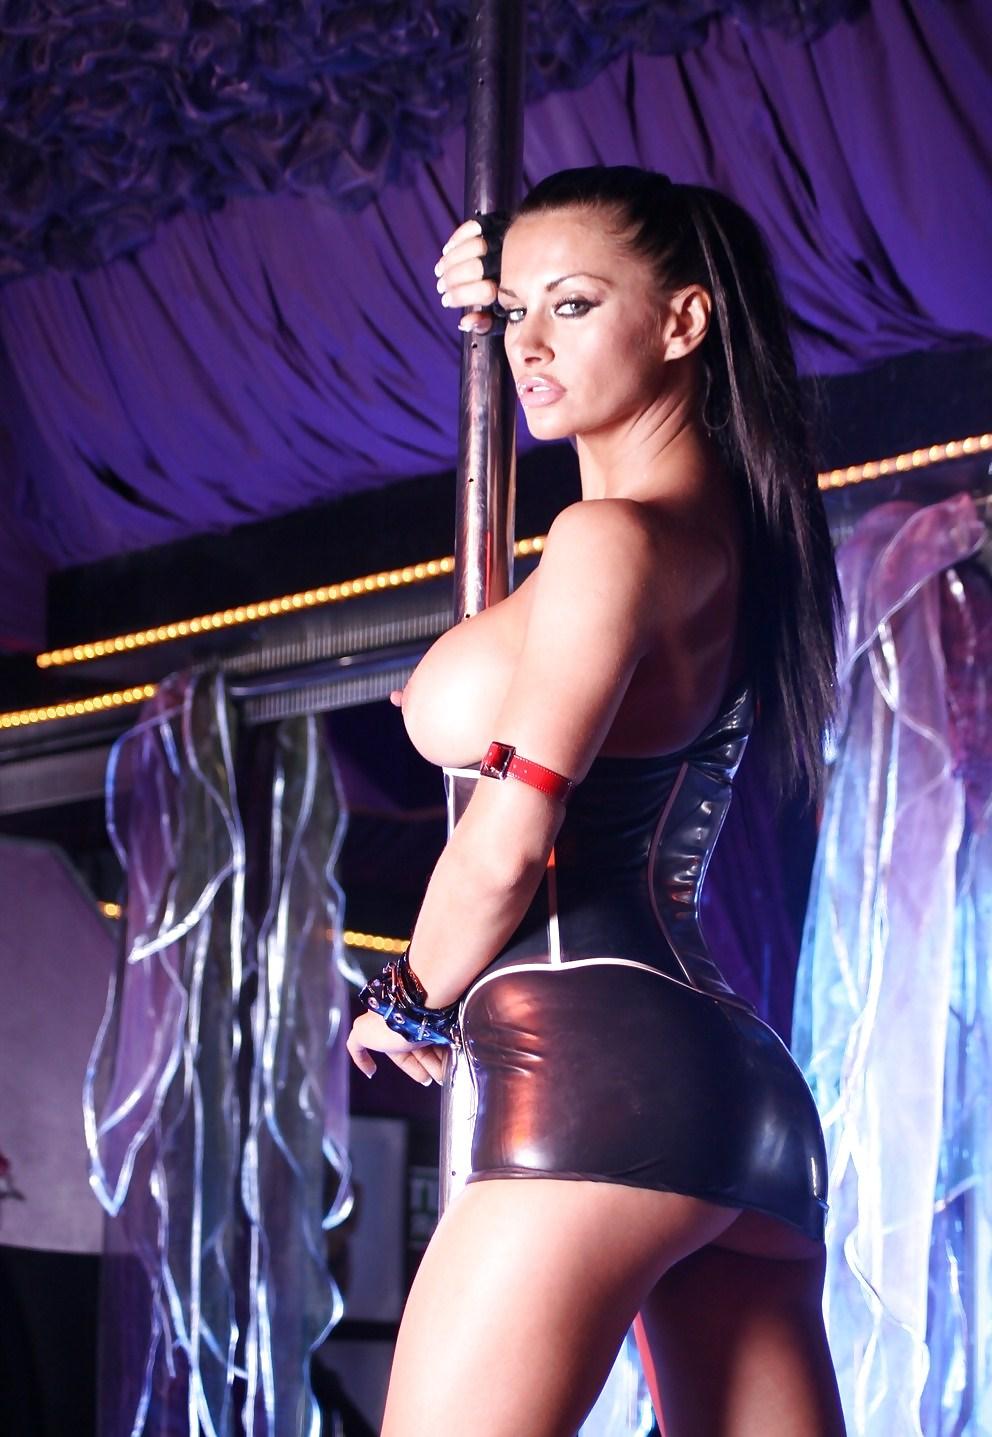 Babestation Porn Star dionne mendez babestation slut - 30 pics - xhamster